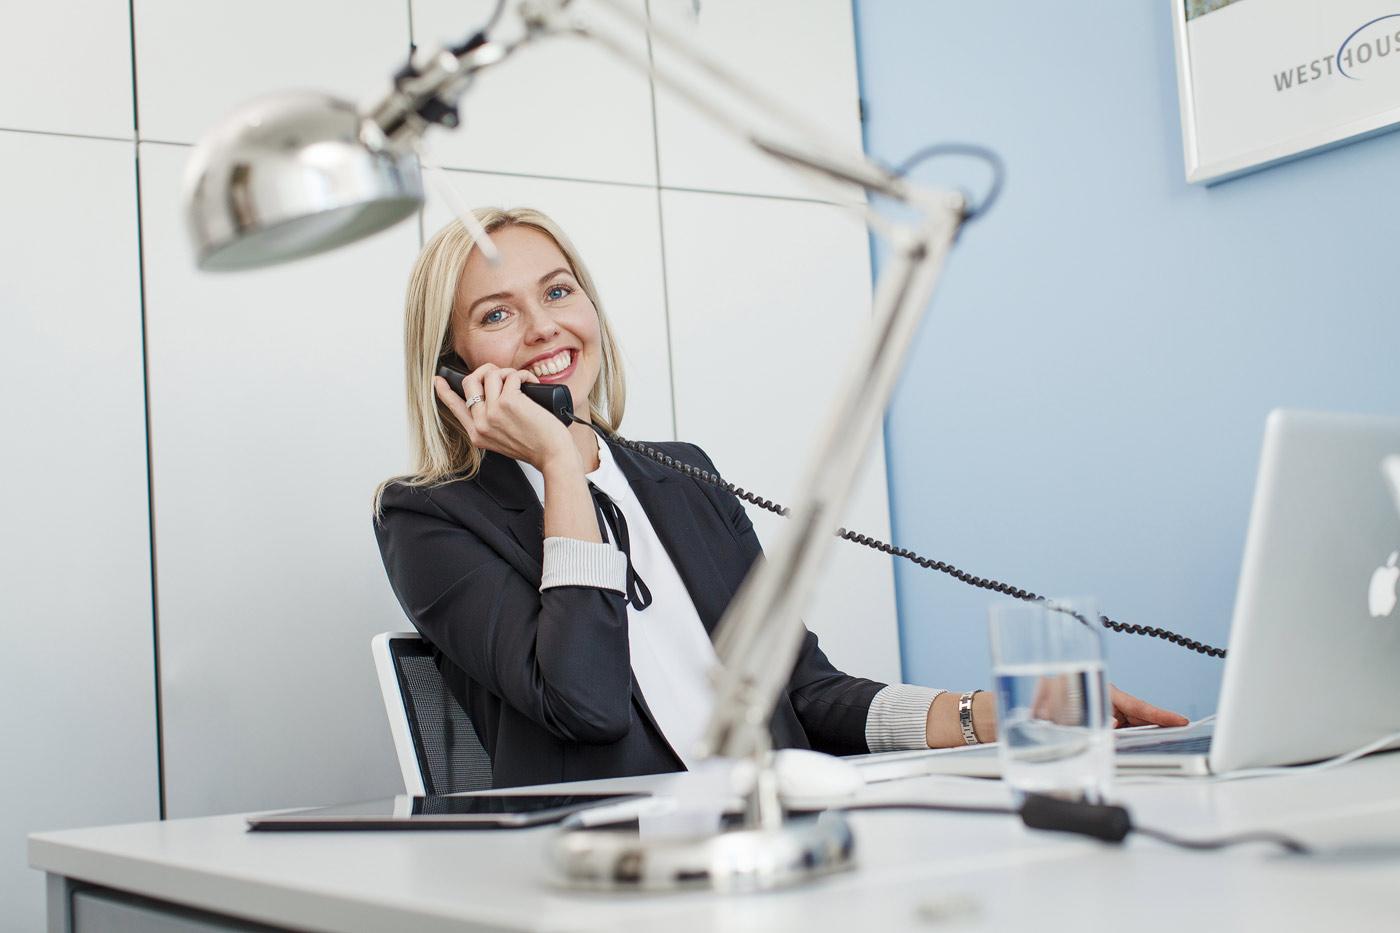 office-buero-frau-unternehmensfotografie